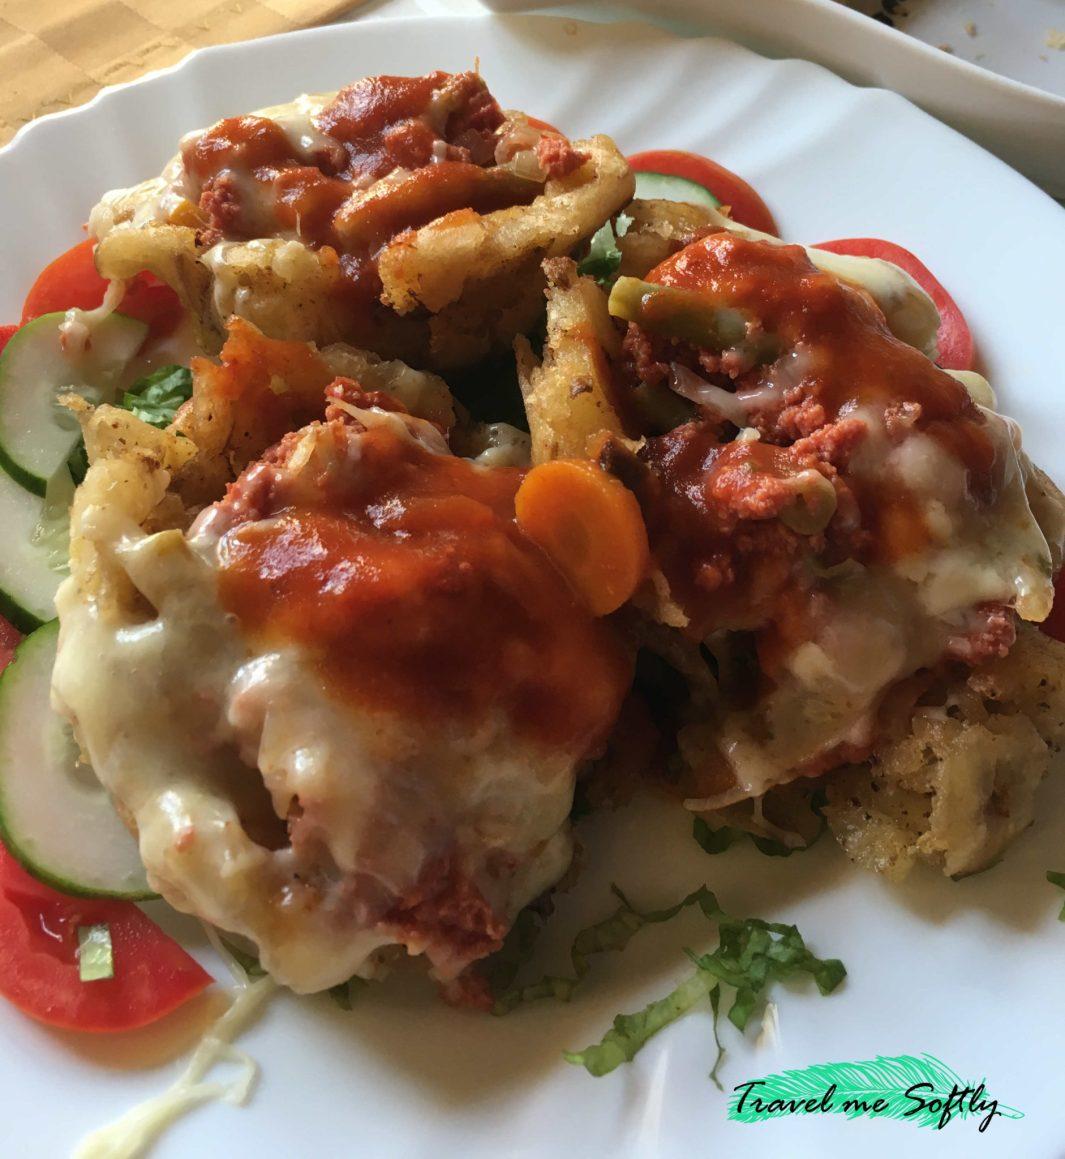 gastronomía cubana tostones rellenos de carne